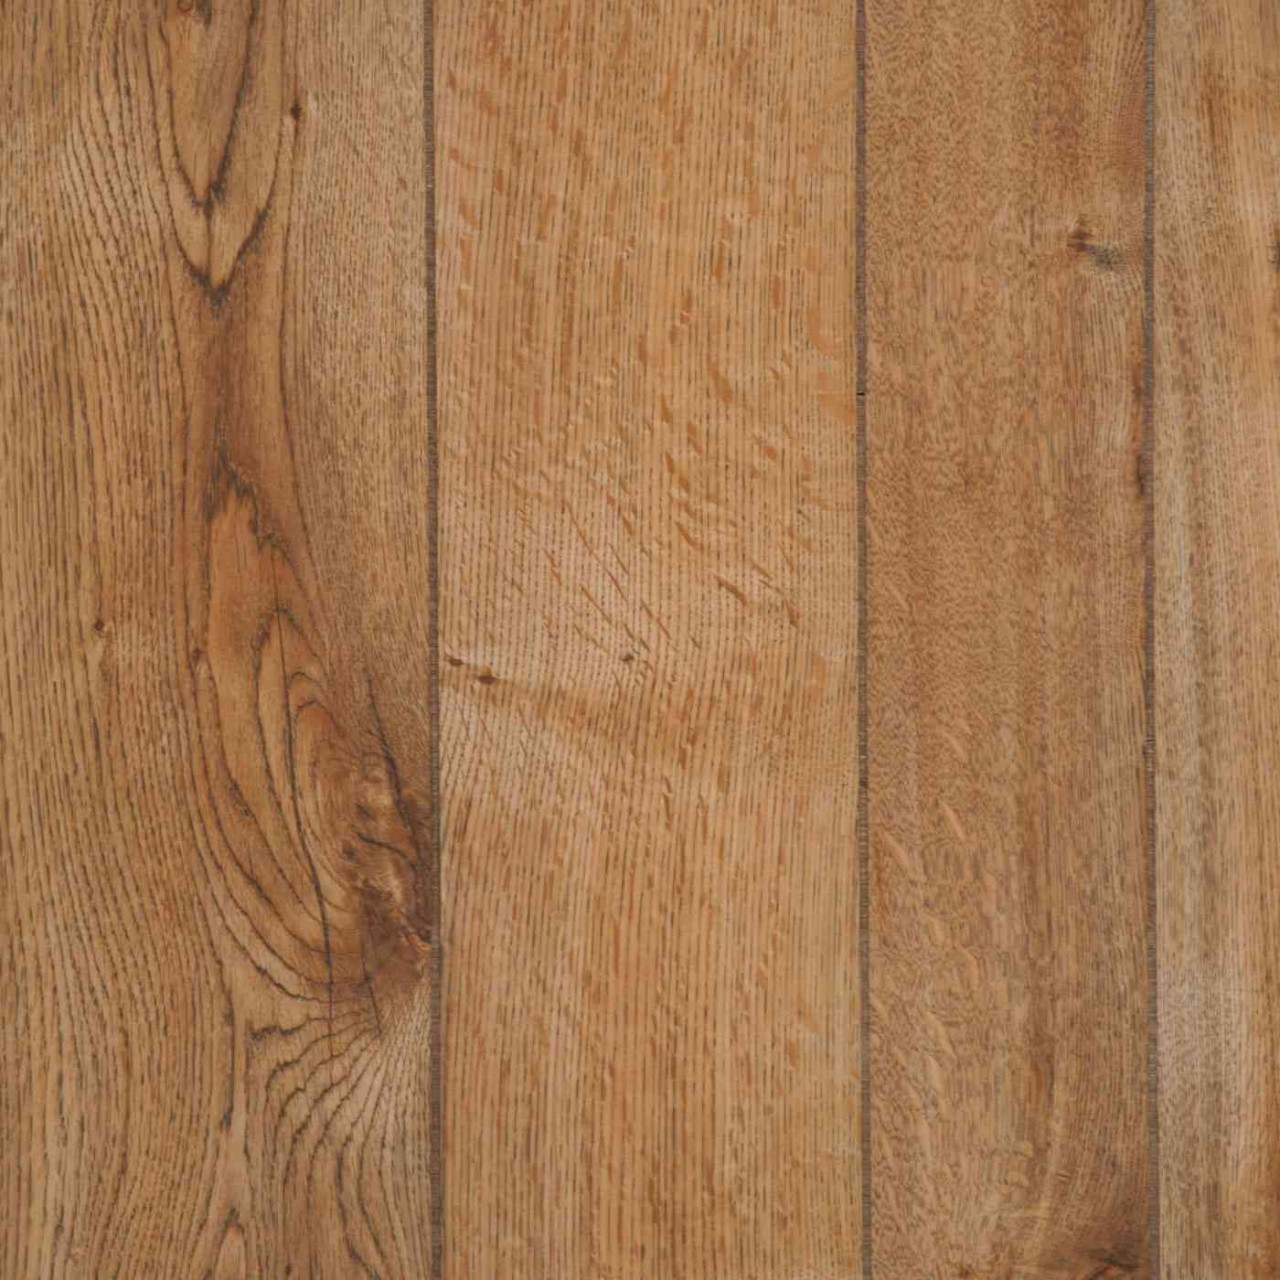 Plywood Wall Paneling : Wood paneling gallant oak wall groove